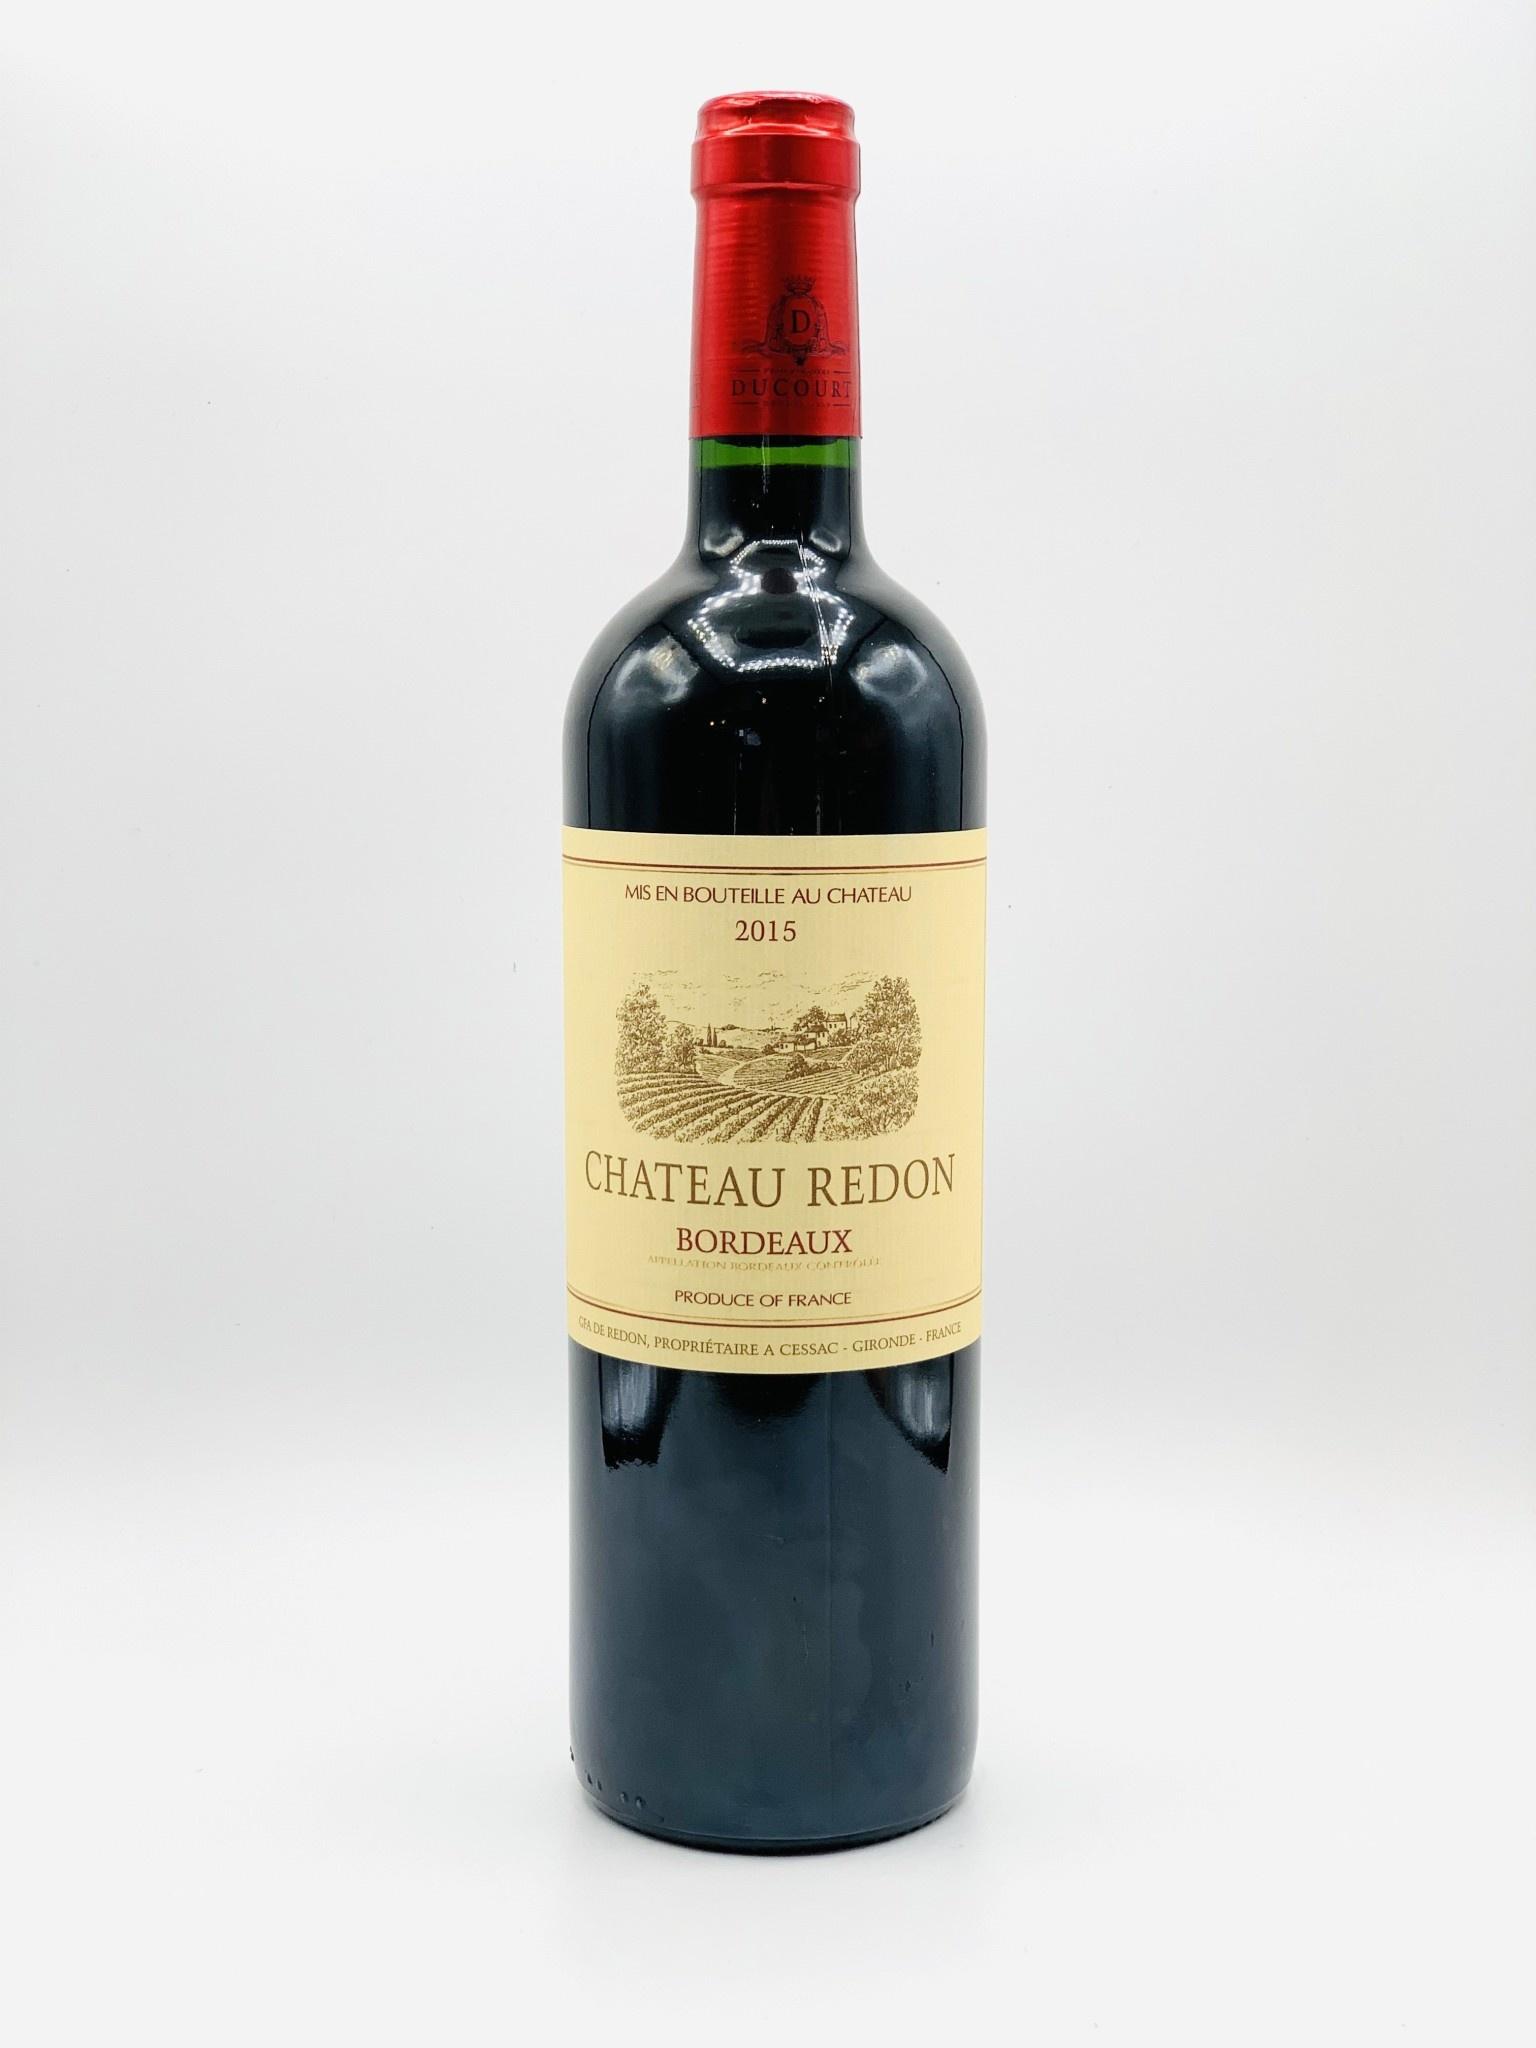 Bordeaux 2015 Chateau Redon 750ml